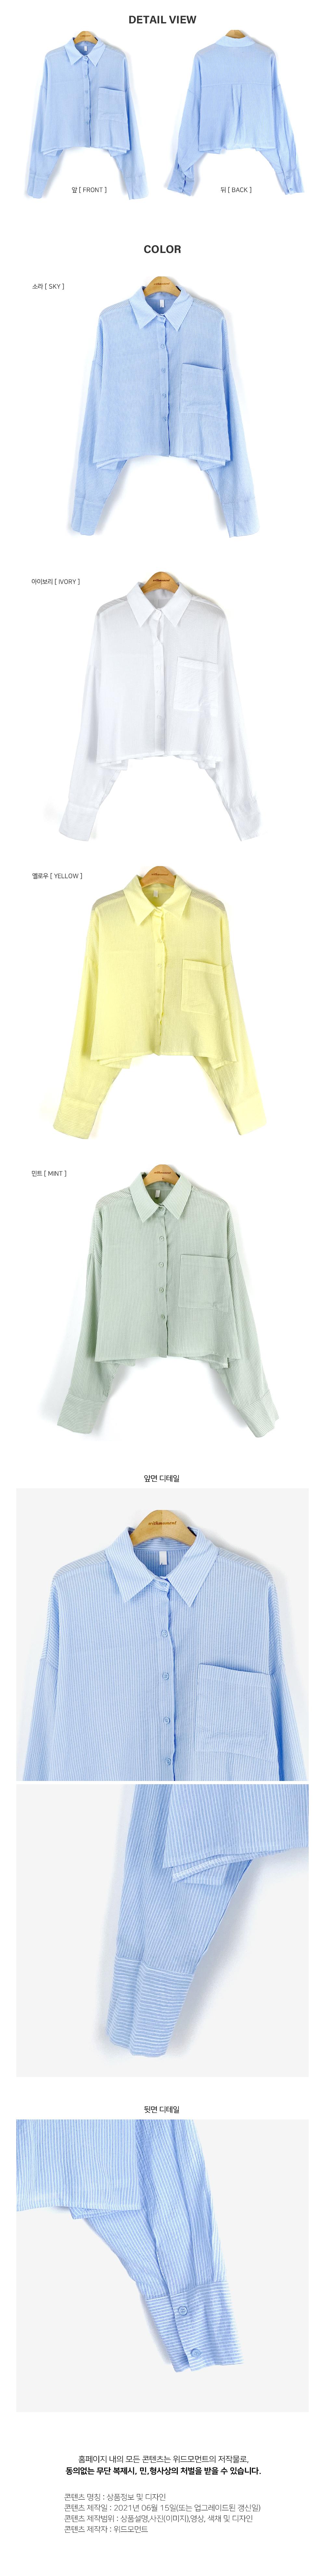 Propion Crop Shirt - 4color